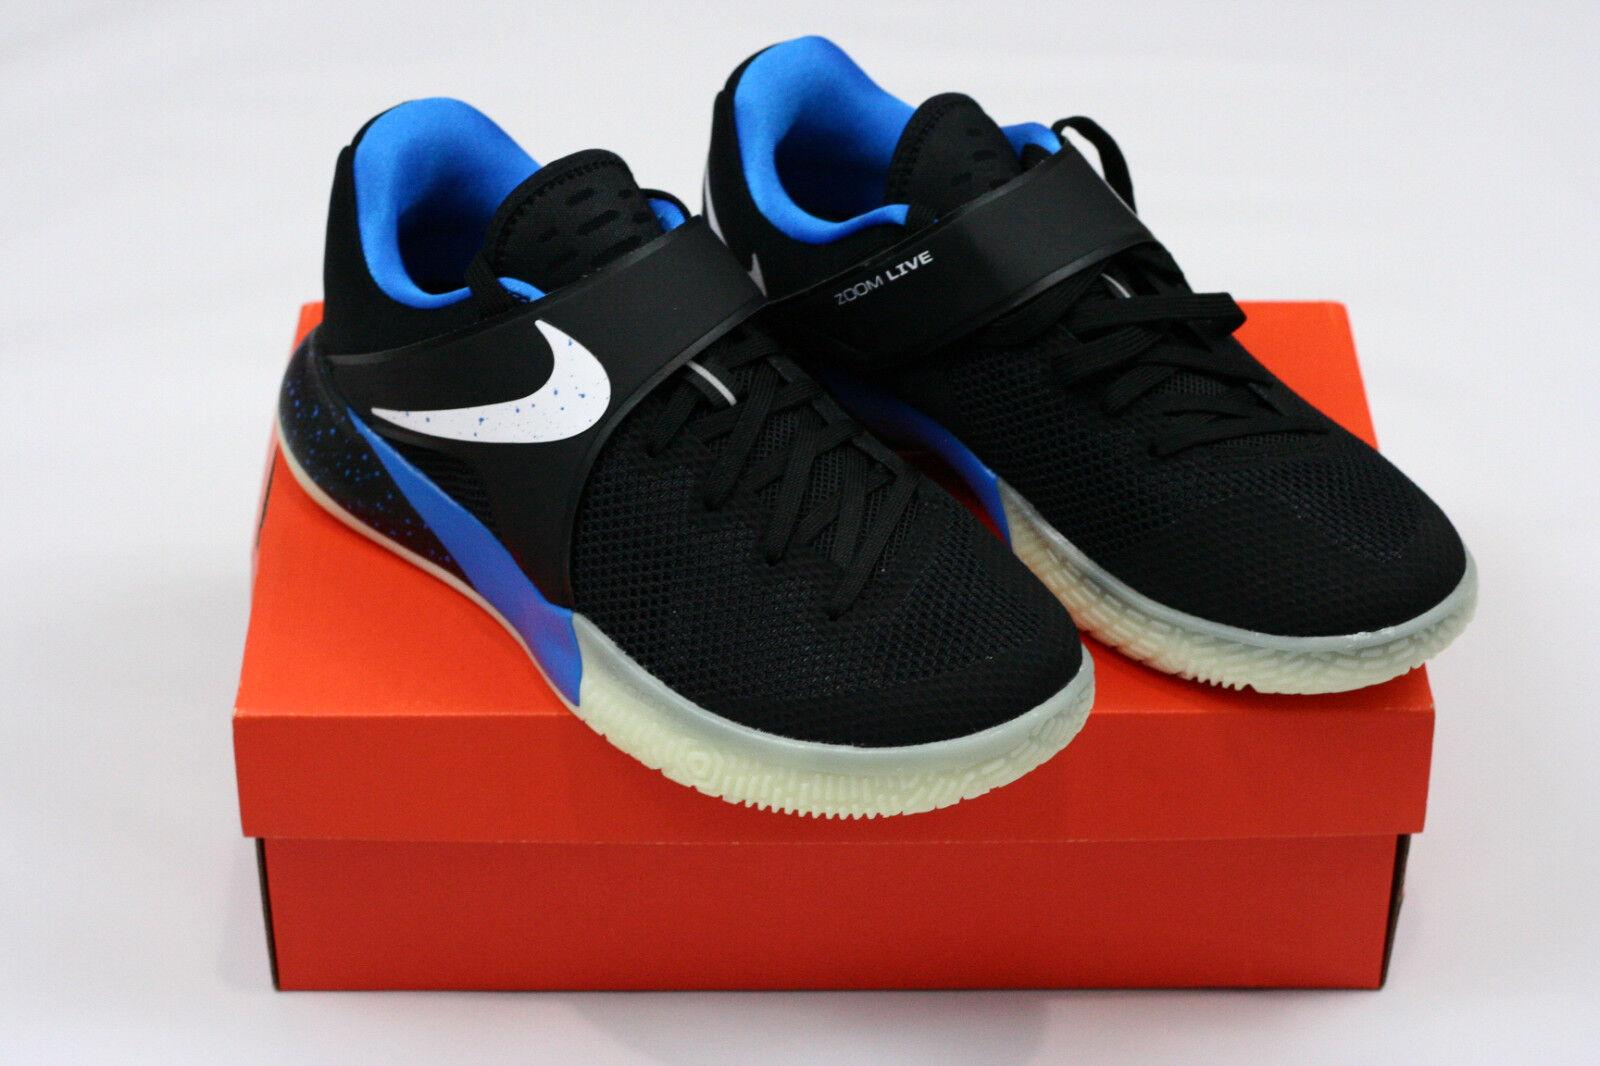 Nike Zoom Live PE ZACH LAVINE Men's shoes Size 8 Black blueee White 910573-014